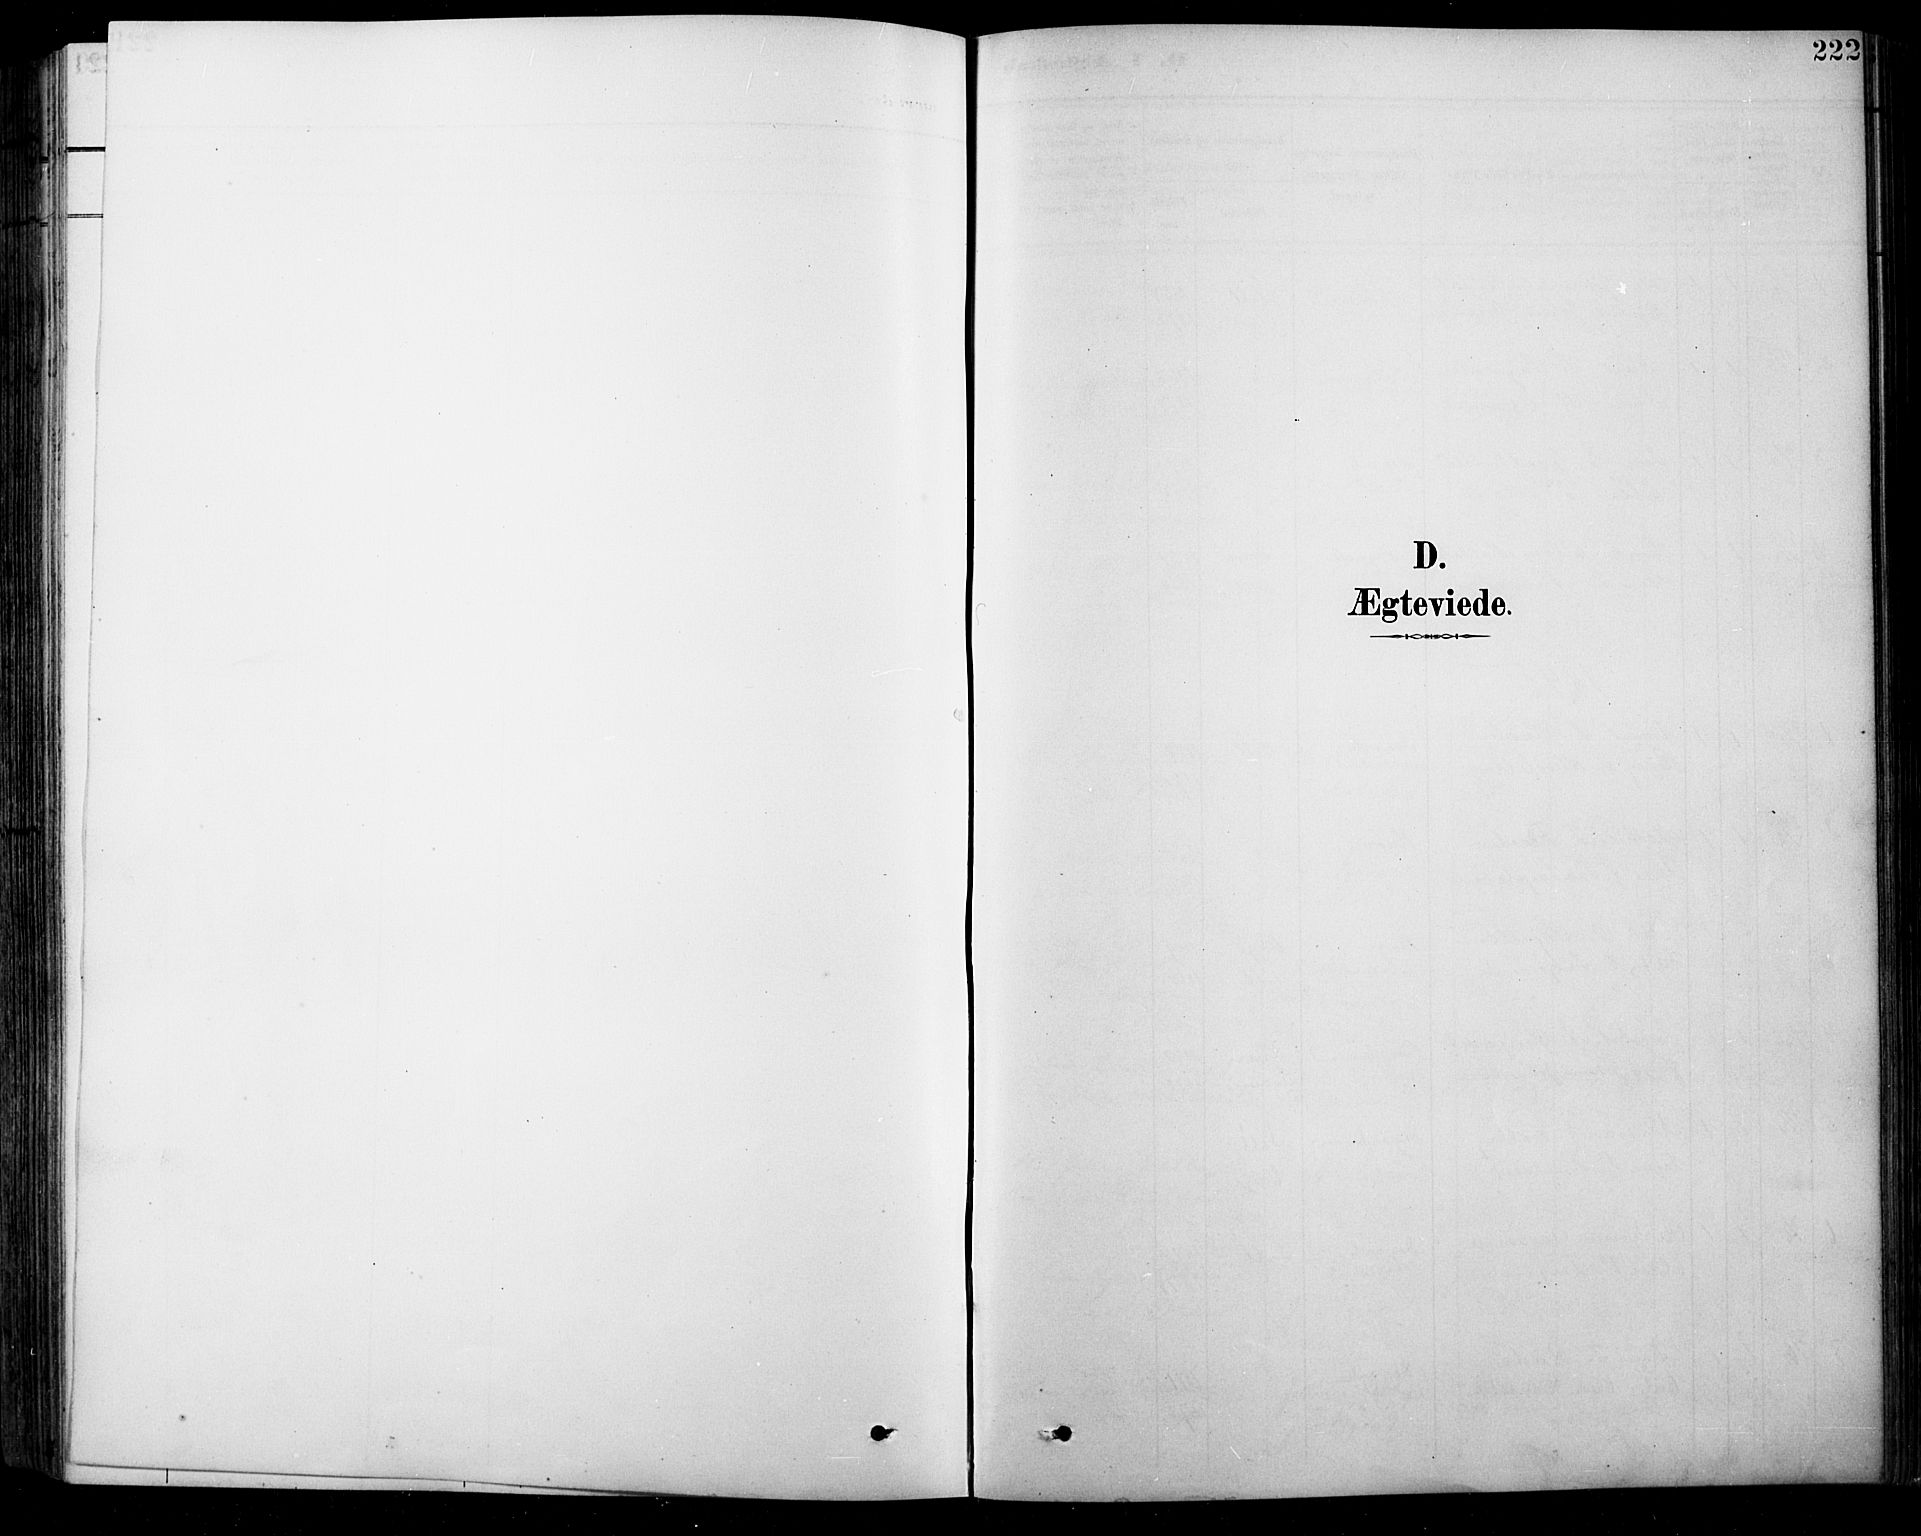 SAH, Sel prestekontor, Klokkerbok nr. 1, 1894-1923, s. 222